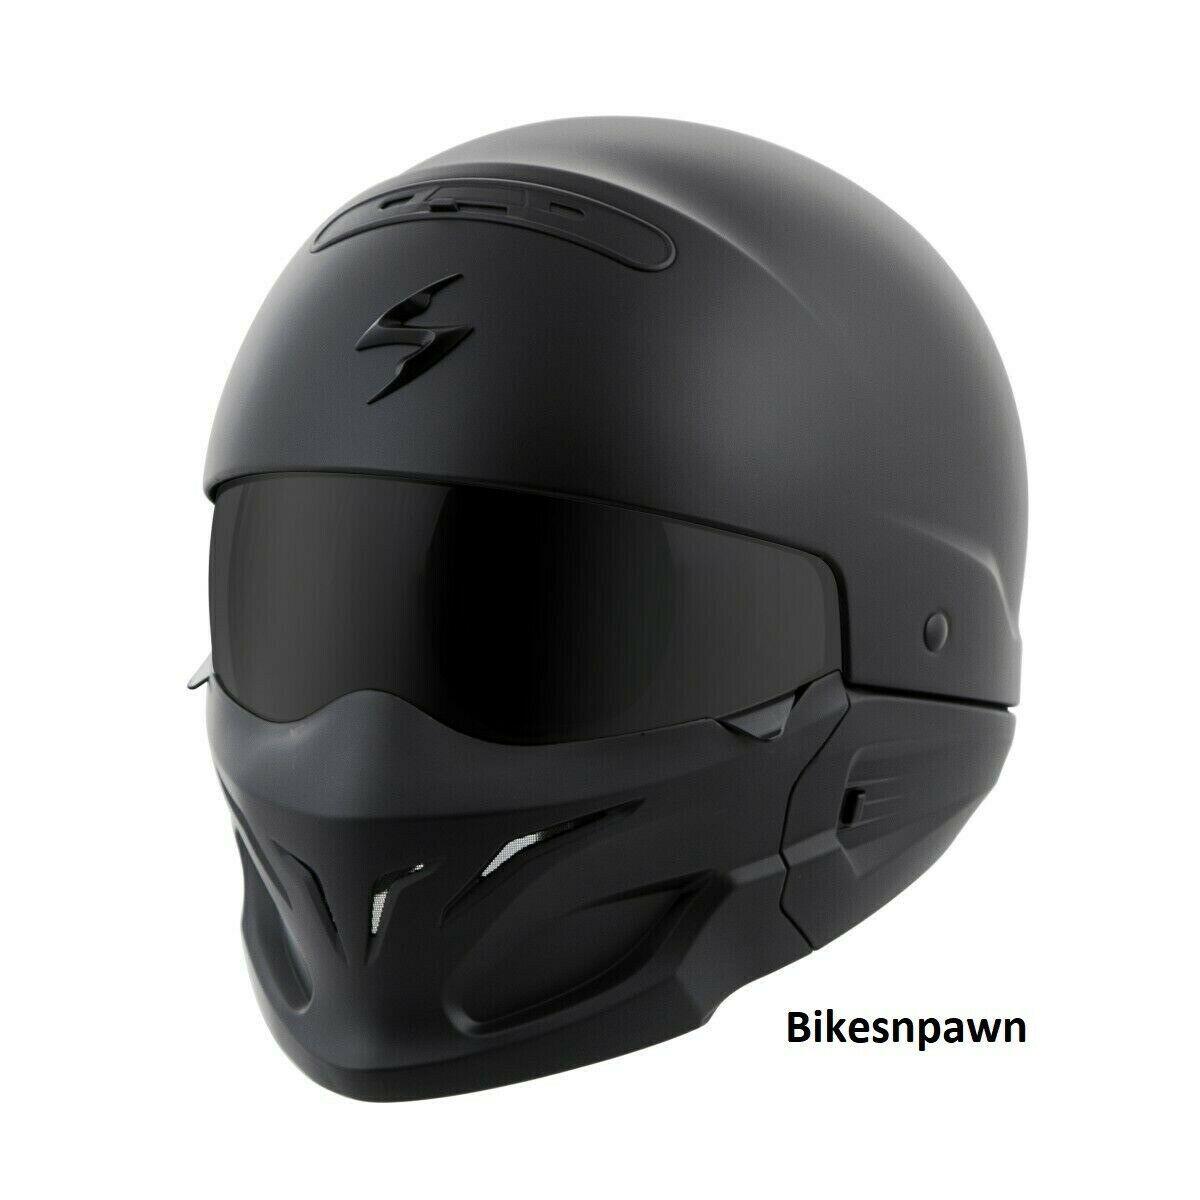 New Size S Scorpion EXO Covert Matt Black 3 in 1 Motorcycle Helmet DOT